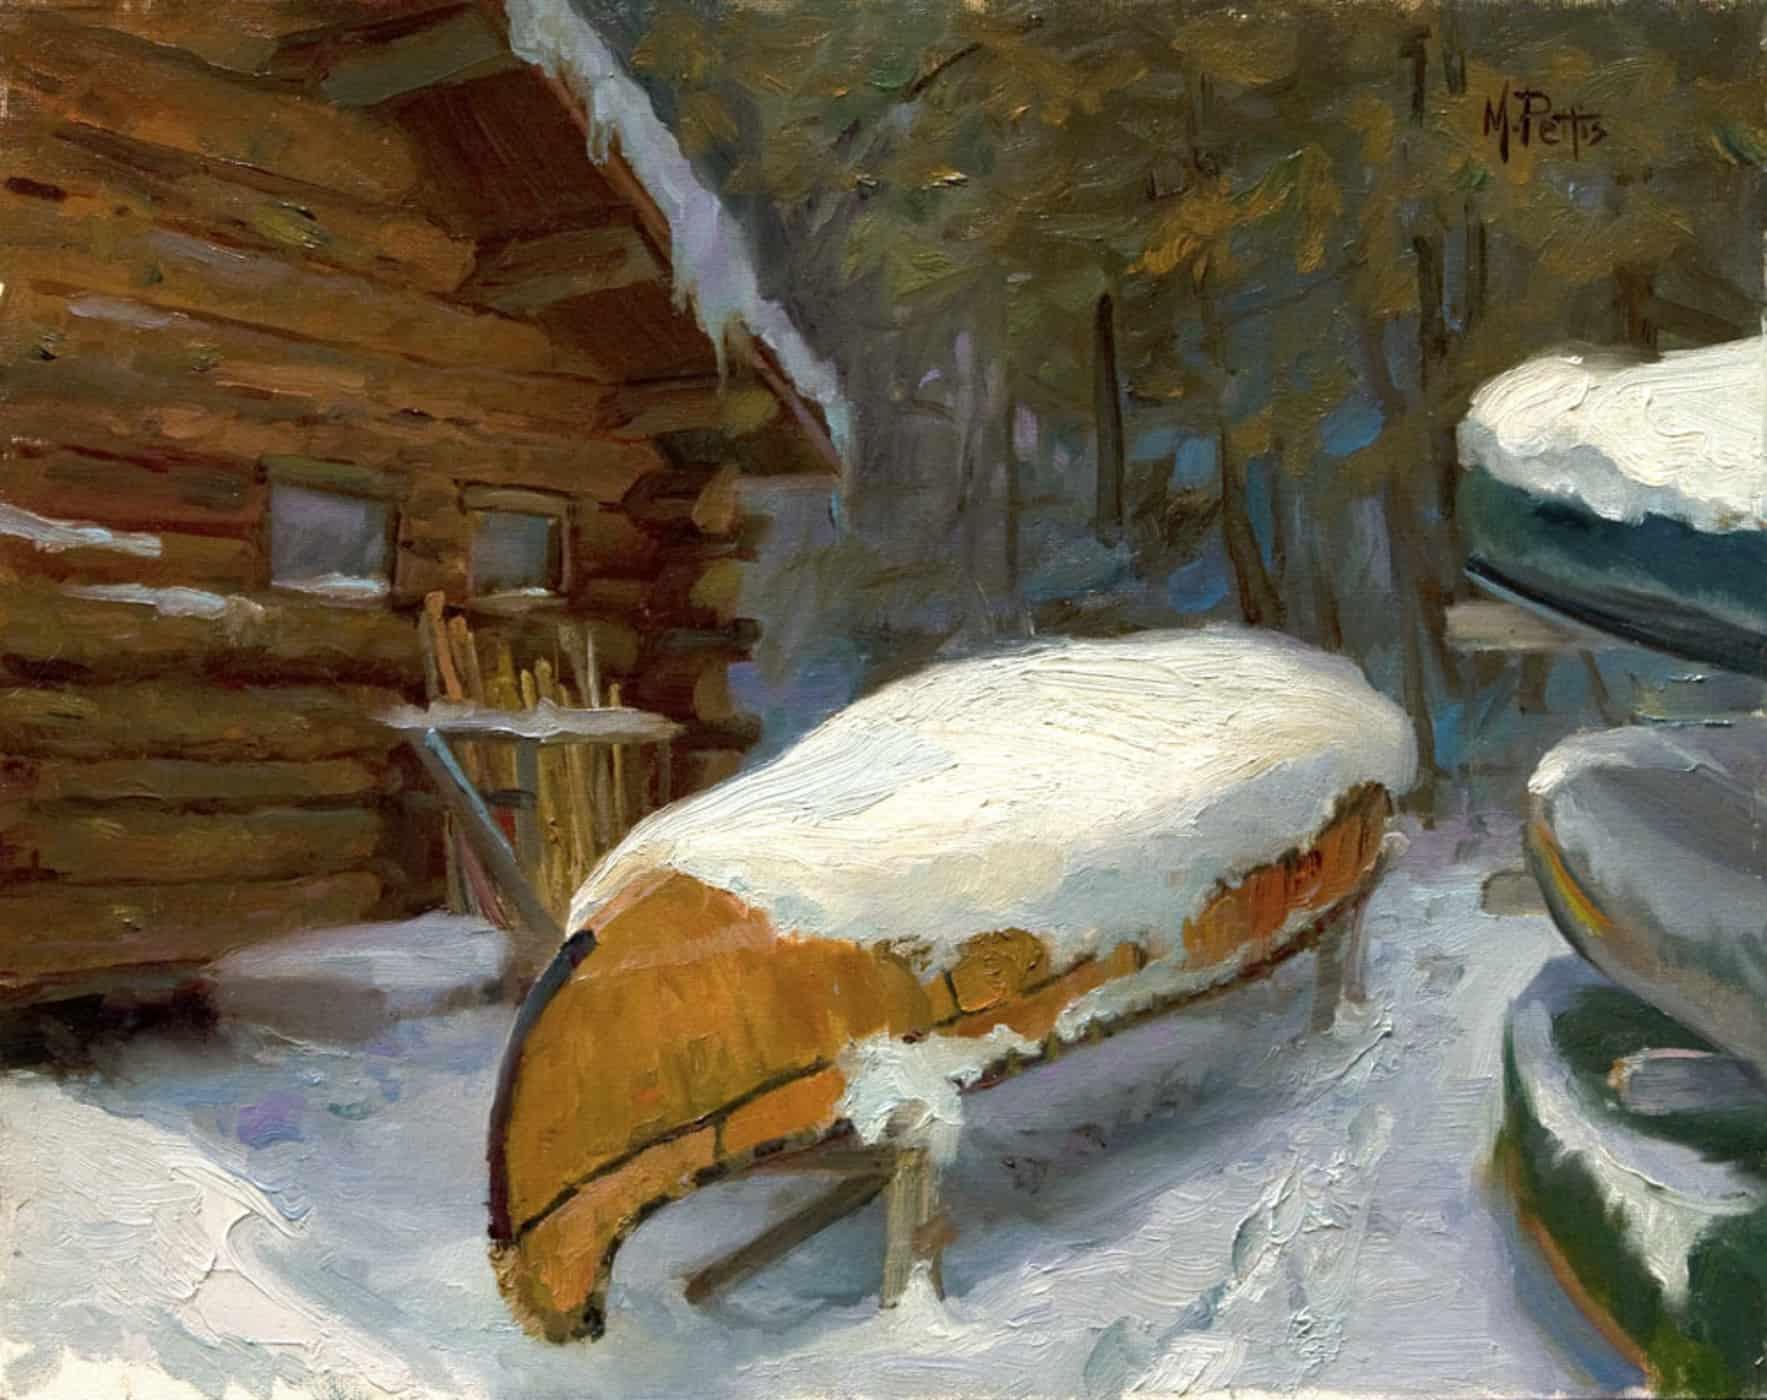 """The Grand Master"" | 12 x 16"" oil on linen, plein air, 2012 | Mary Pettis"